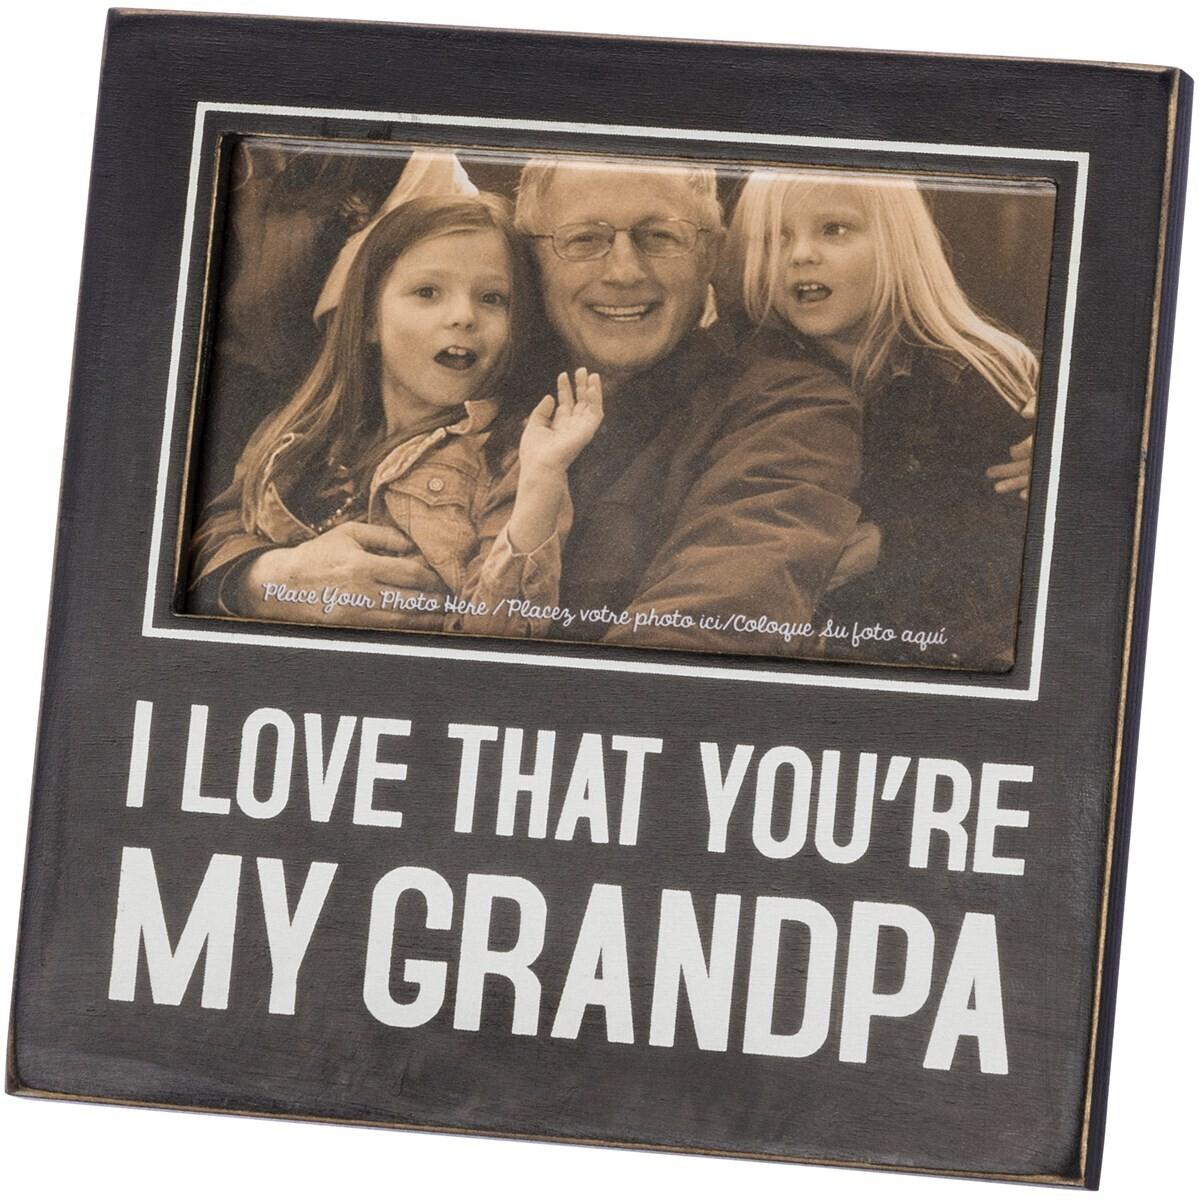 You're My Grandpa Frame